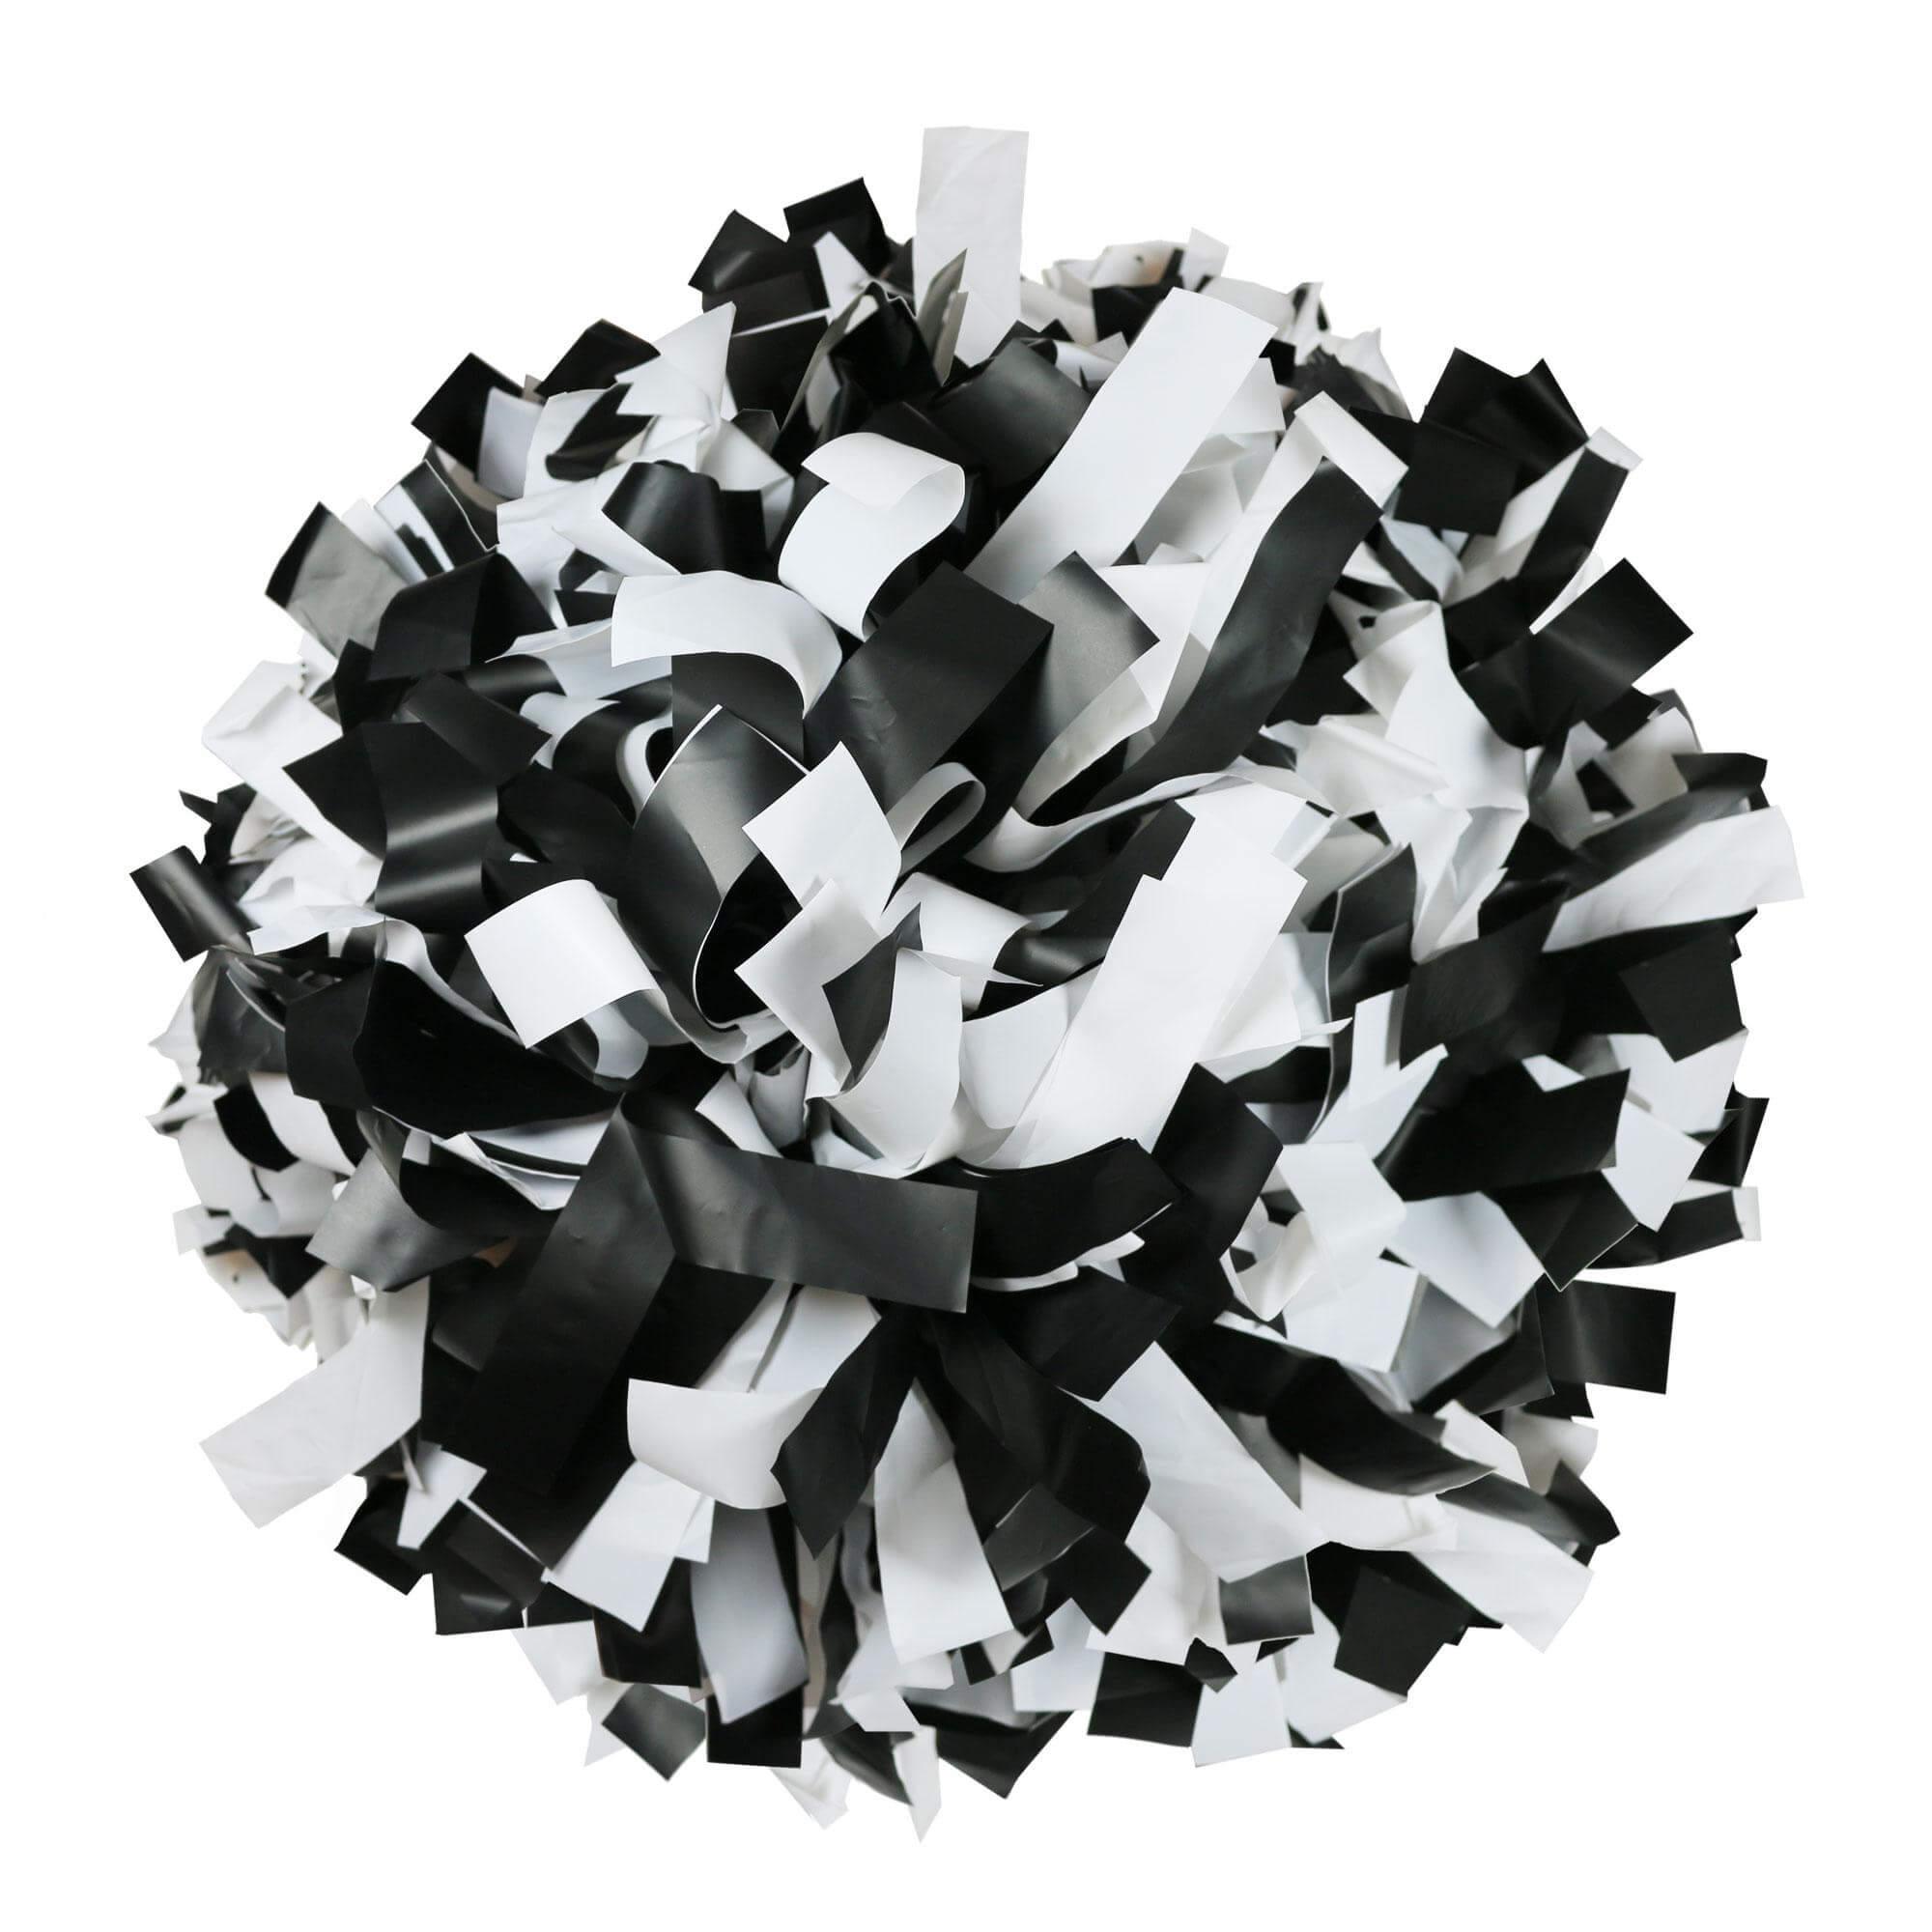 Danzcue Black/White Plastic Poms